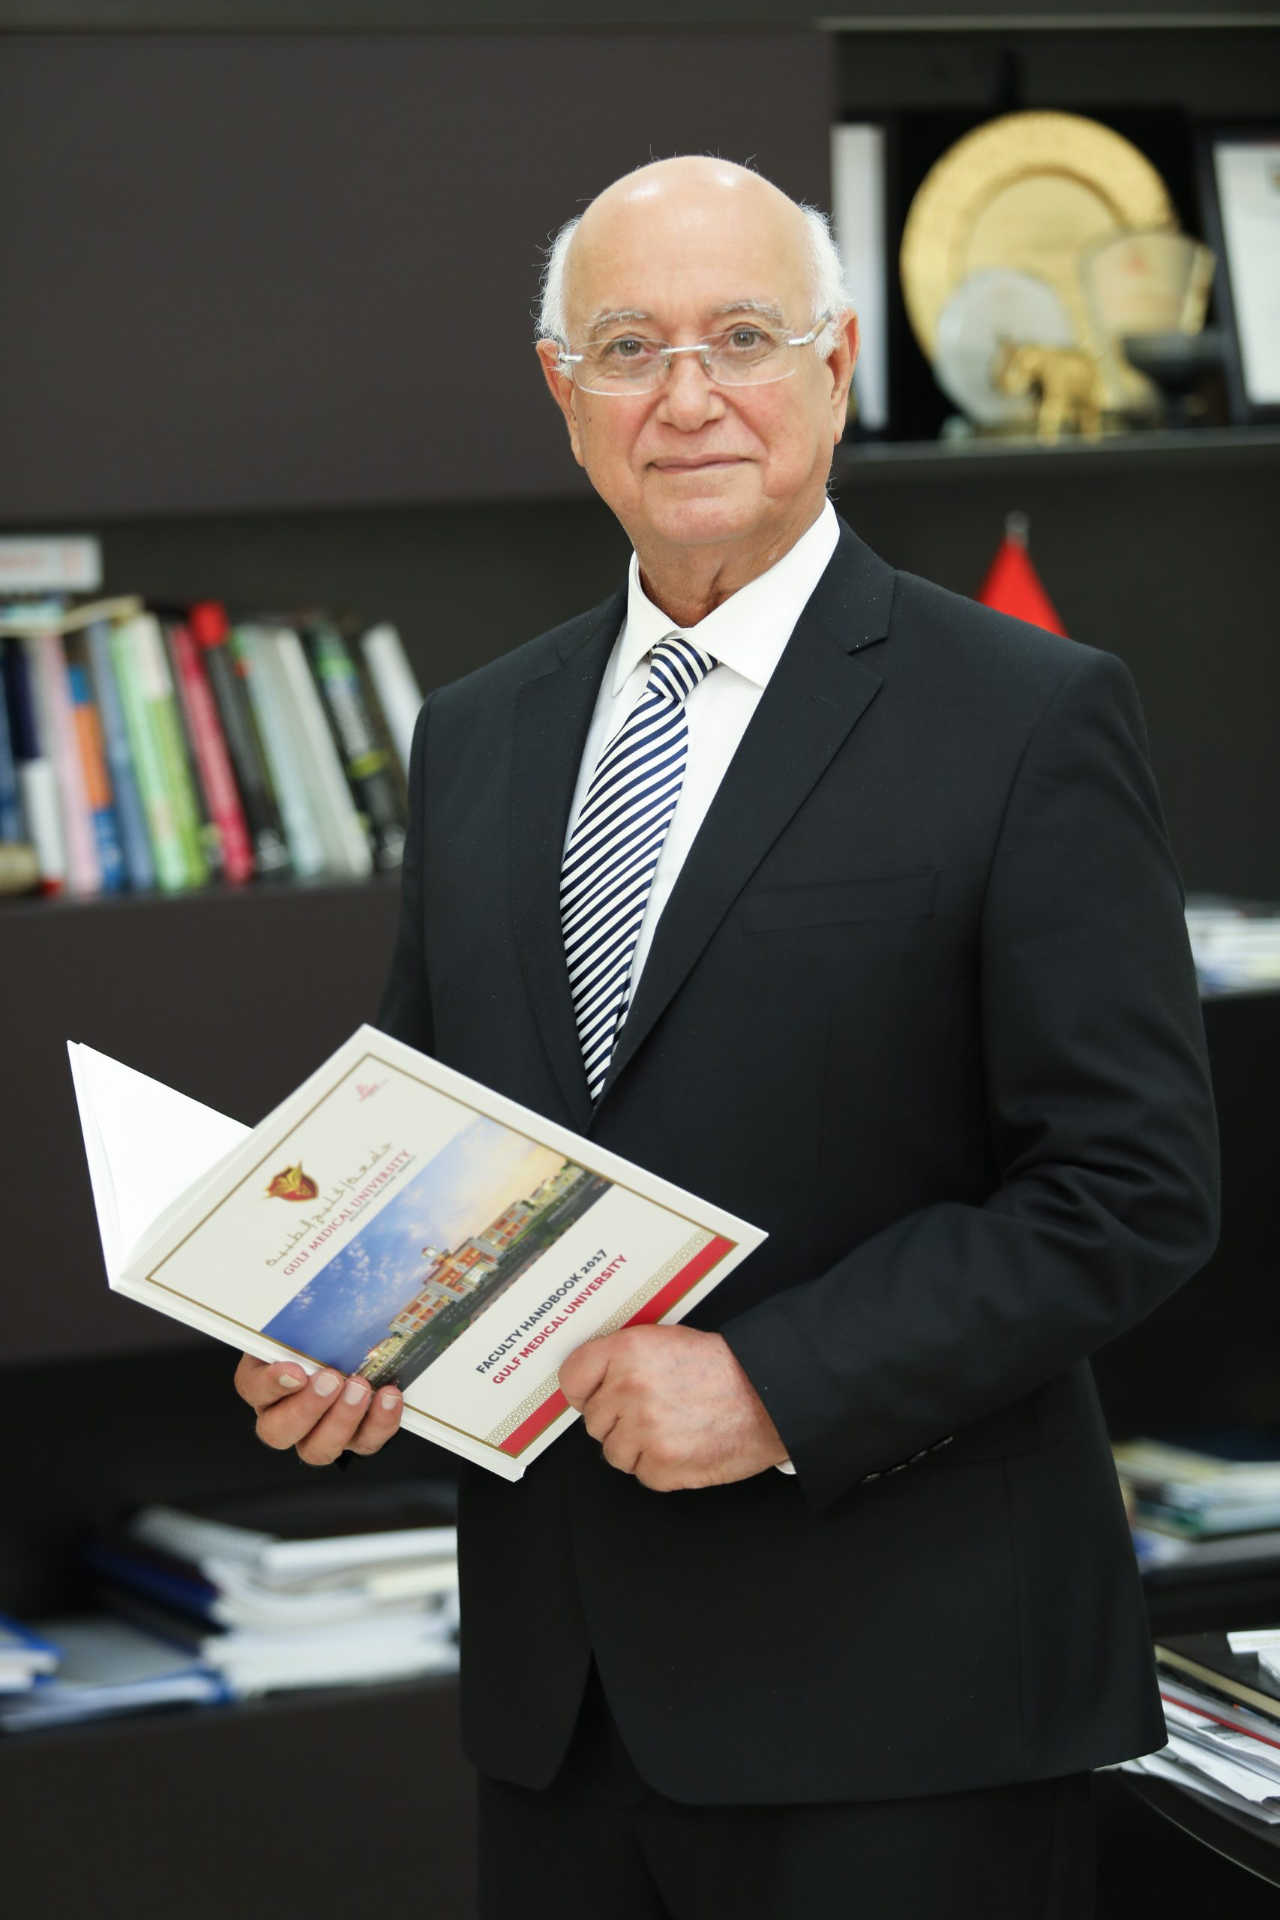 Professor Hossam Hamdy